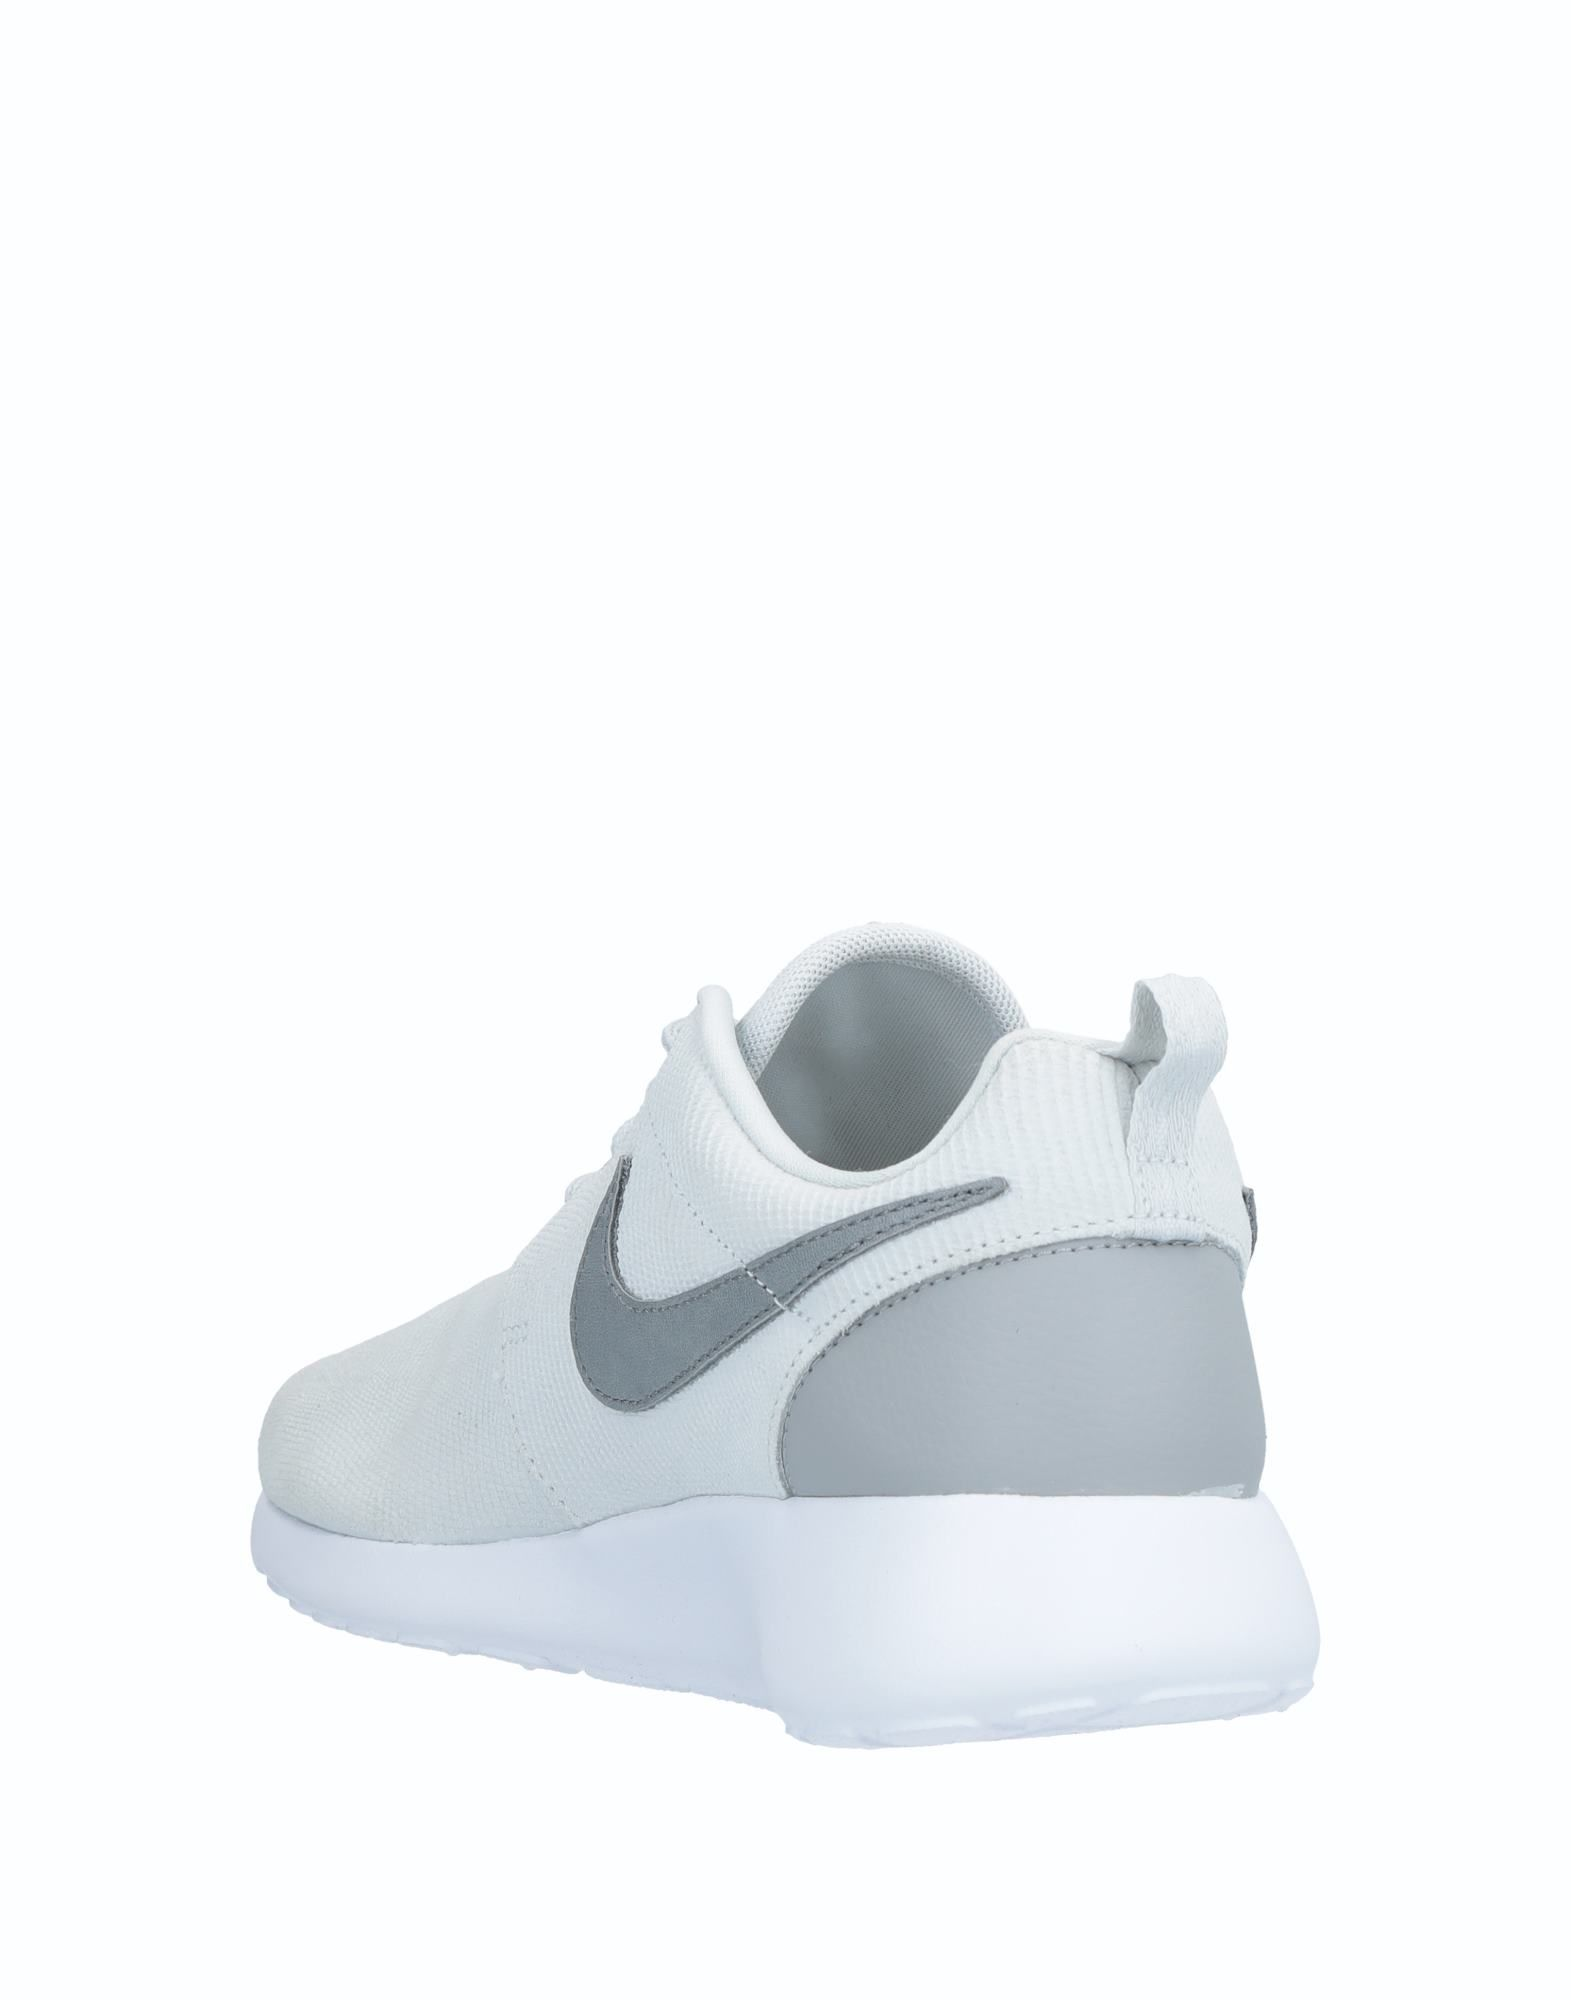 Nike Sneakers Damen  Qualität 11537692LJ Gute Qualität  beliebte Schuhe 4c11ac